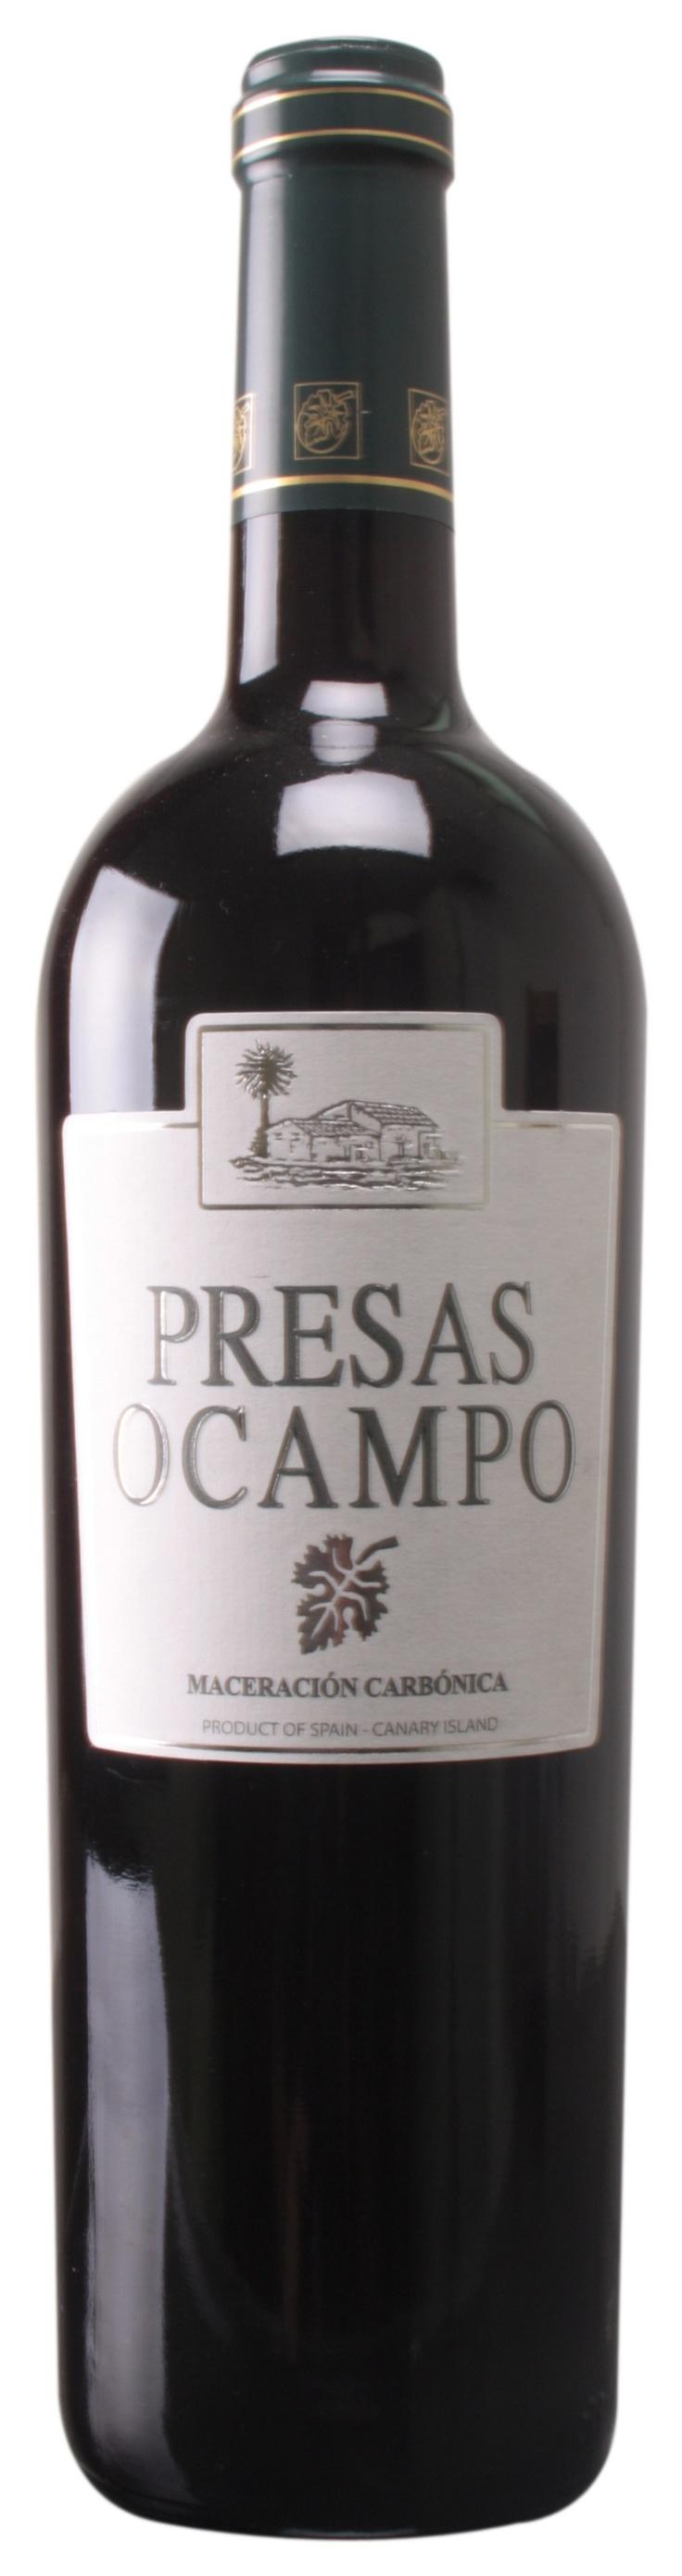 Presas Ocampo Maceración Carbónica 2012 (D.O. Tacoronte-Acentejo) #VinosdeTenerife